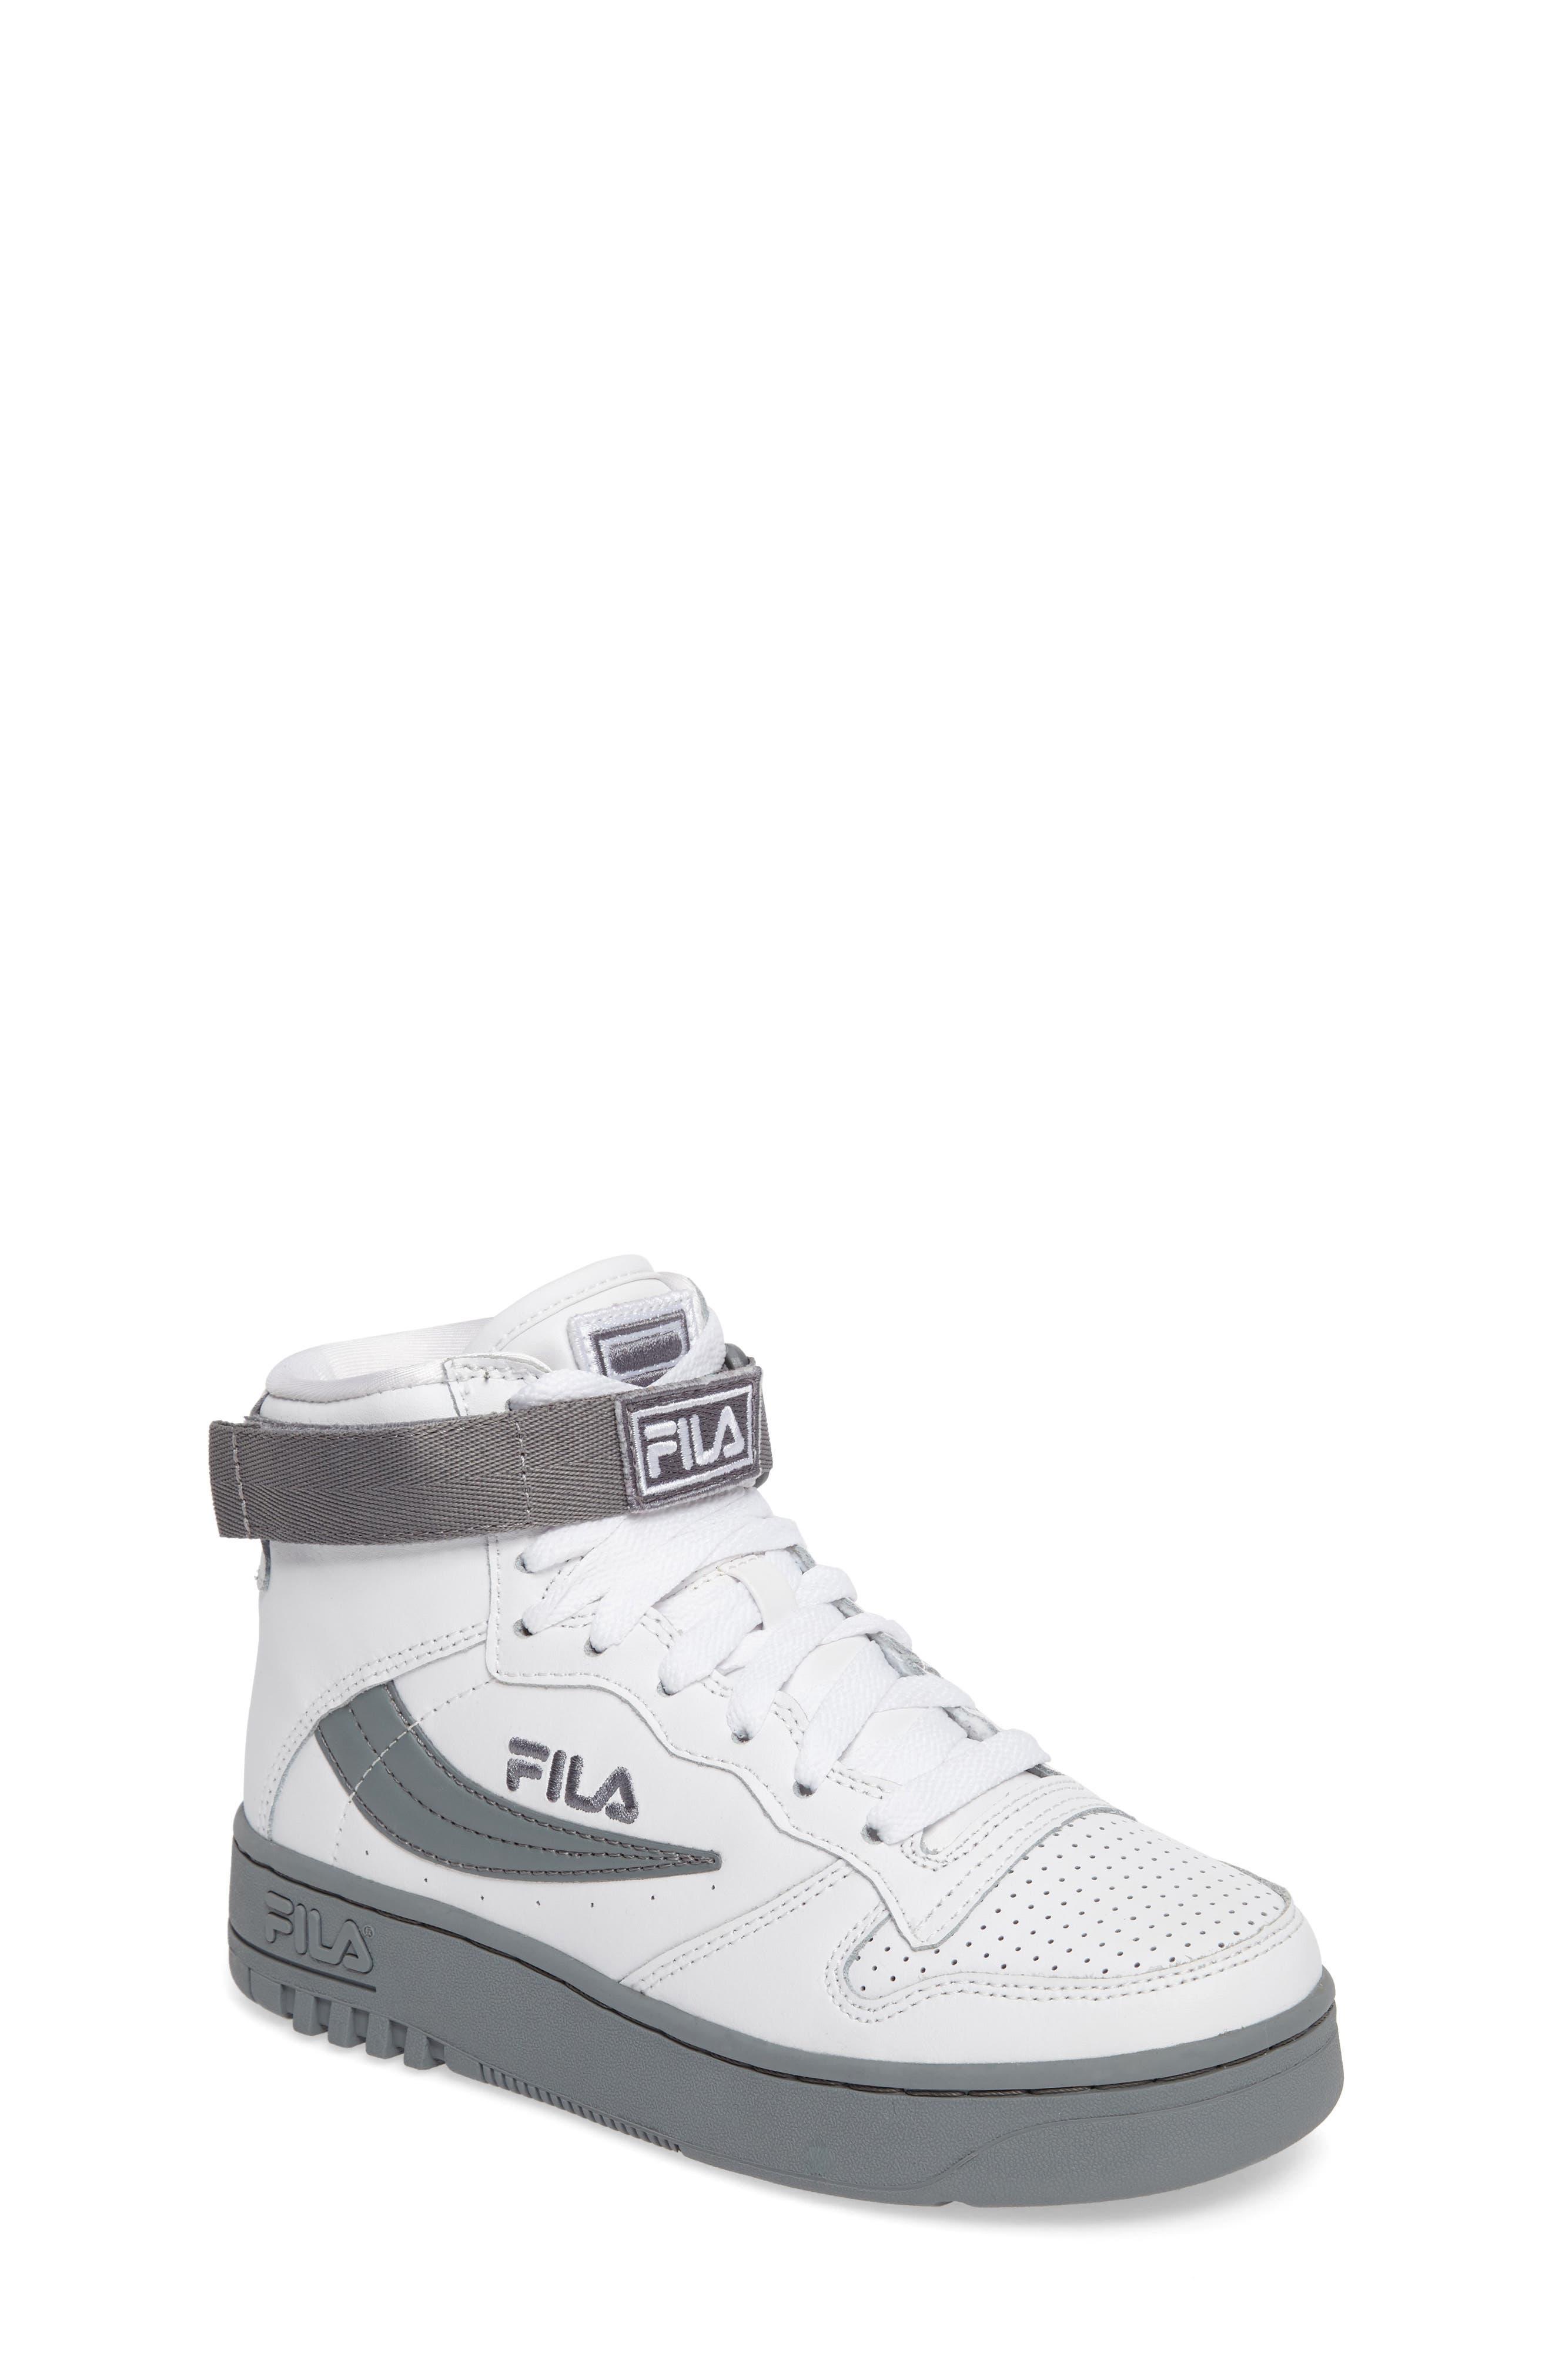 Alternate Image 1 Selected - FILA FX-100 High Top Sneaker (Big Kid)